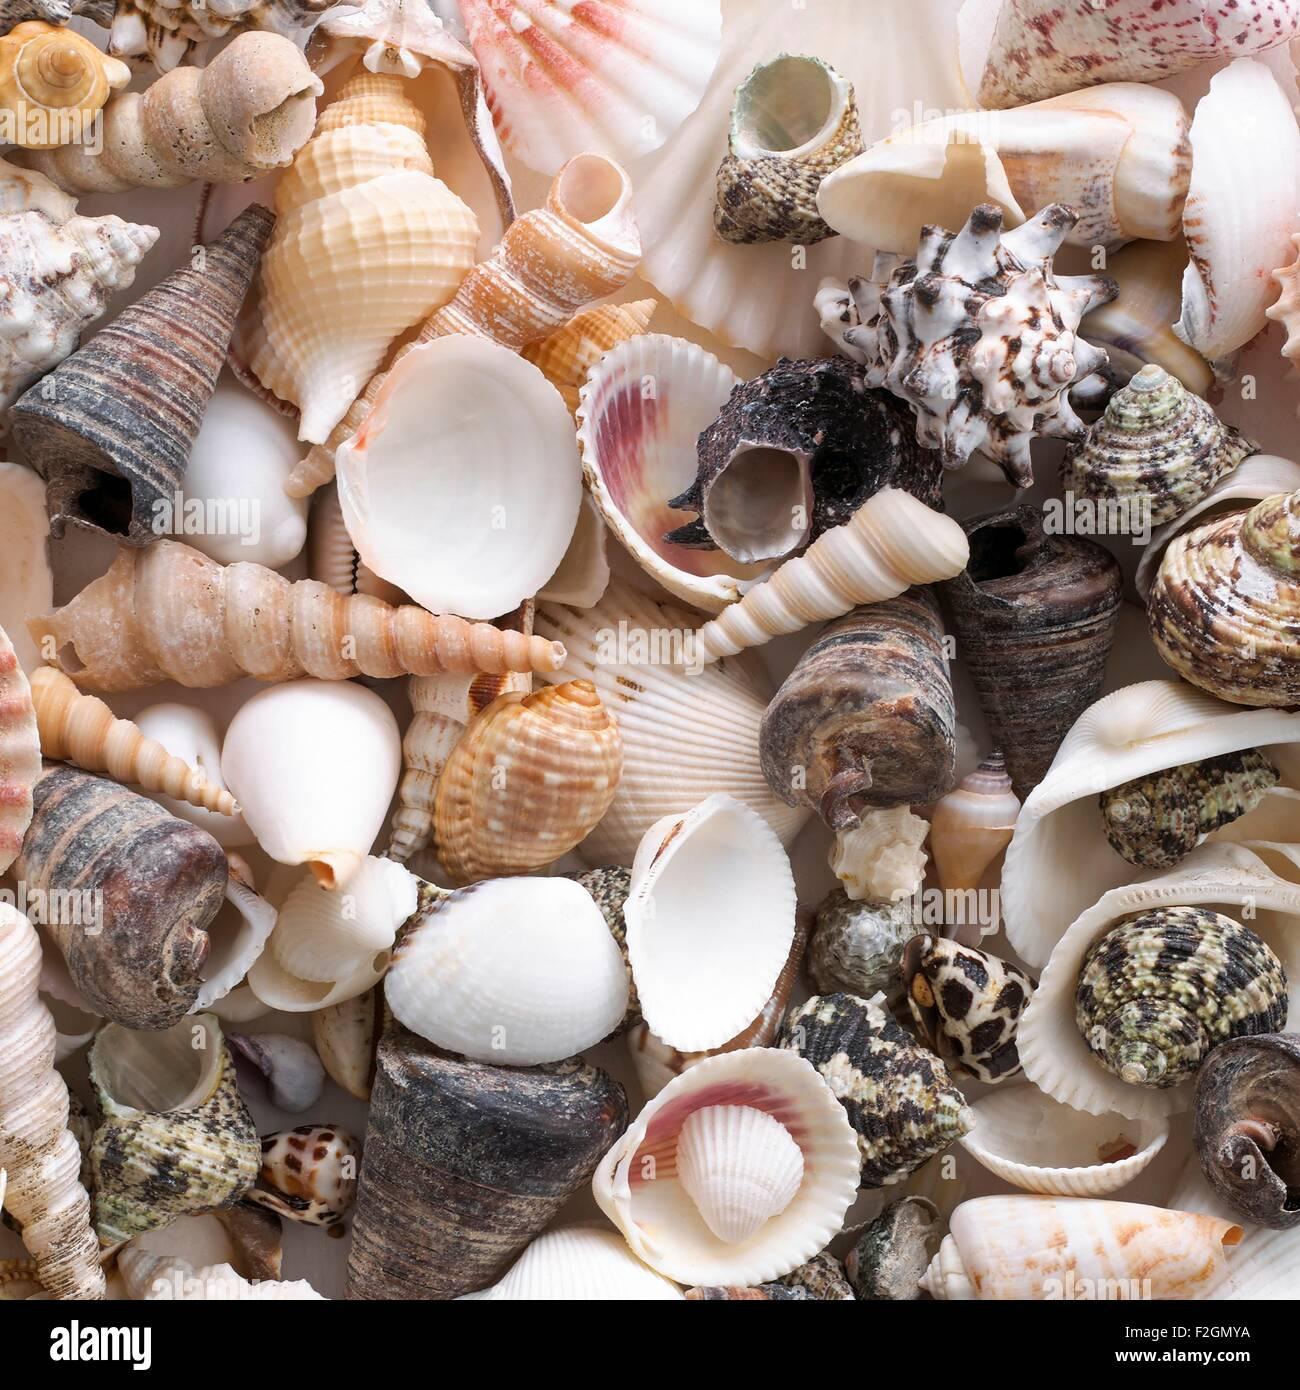 Selection of sea shells - Stock Image